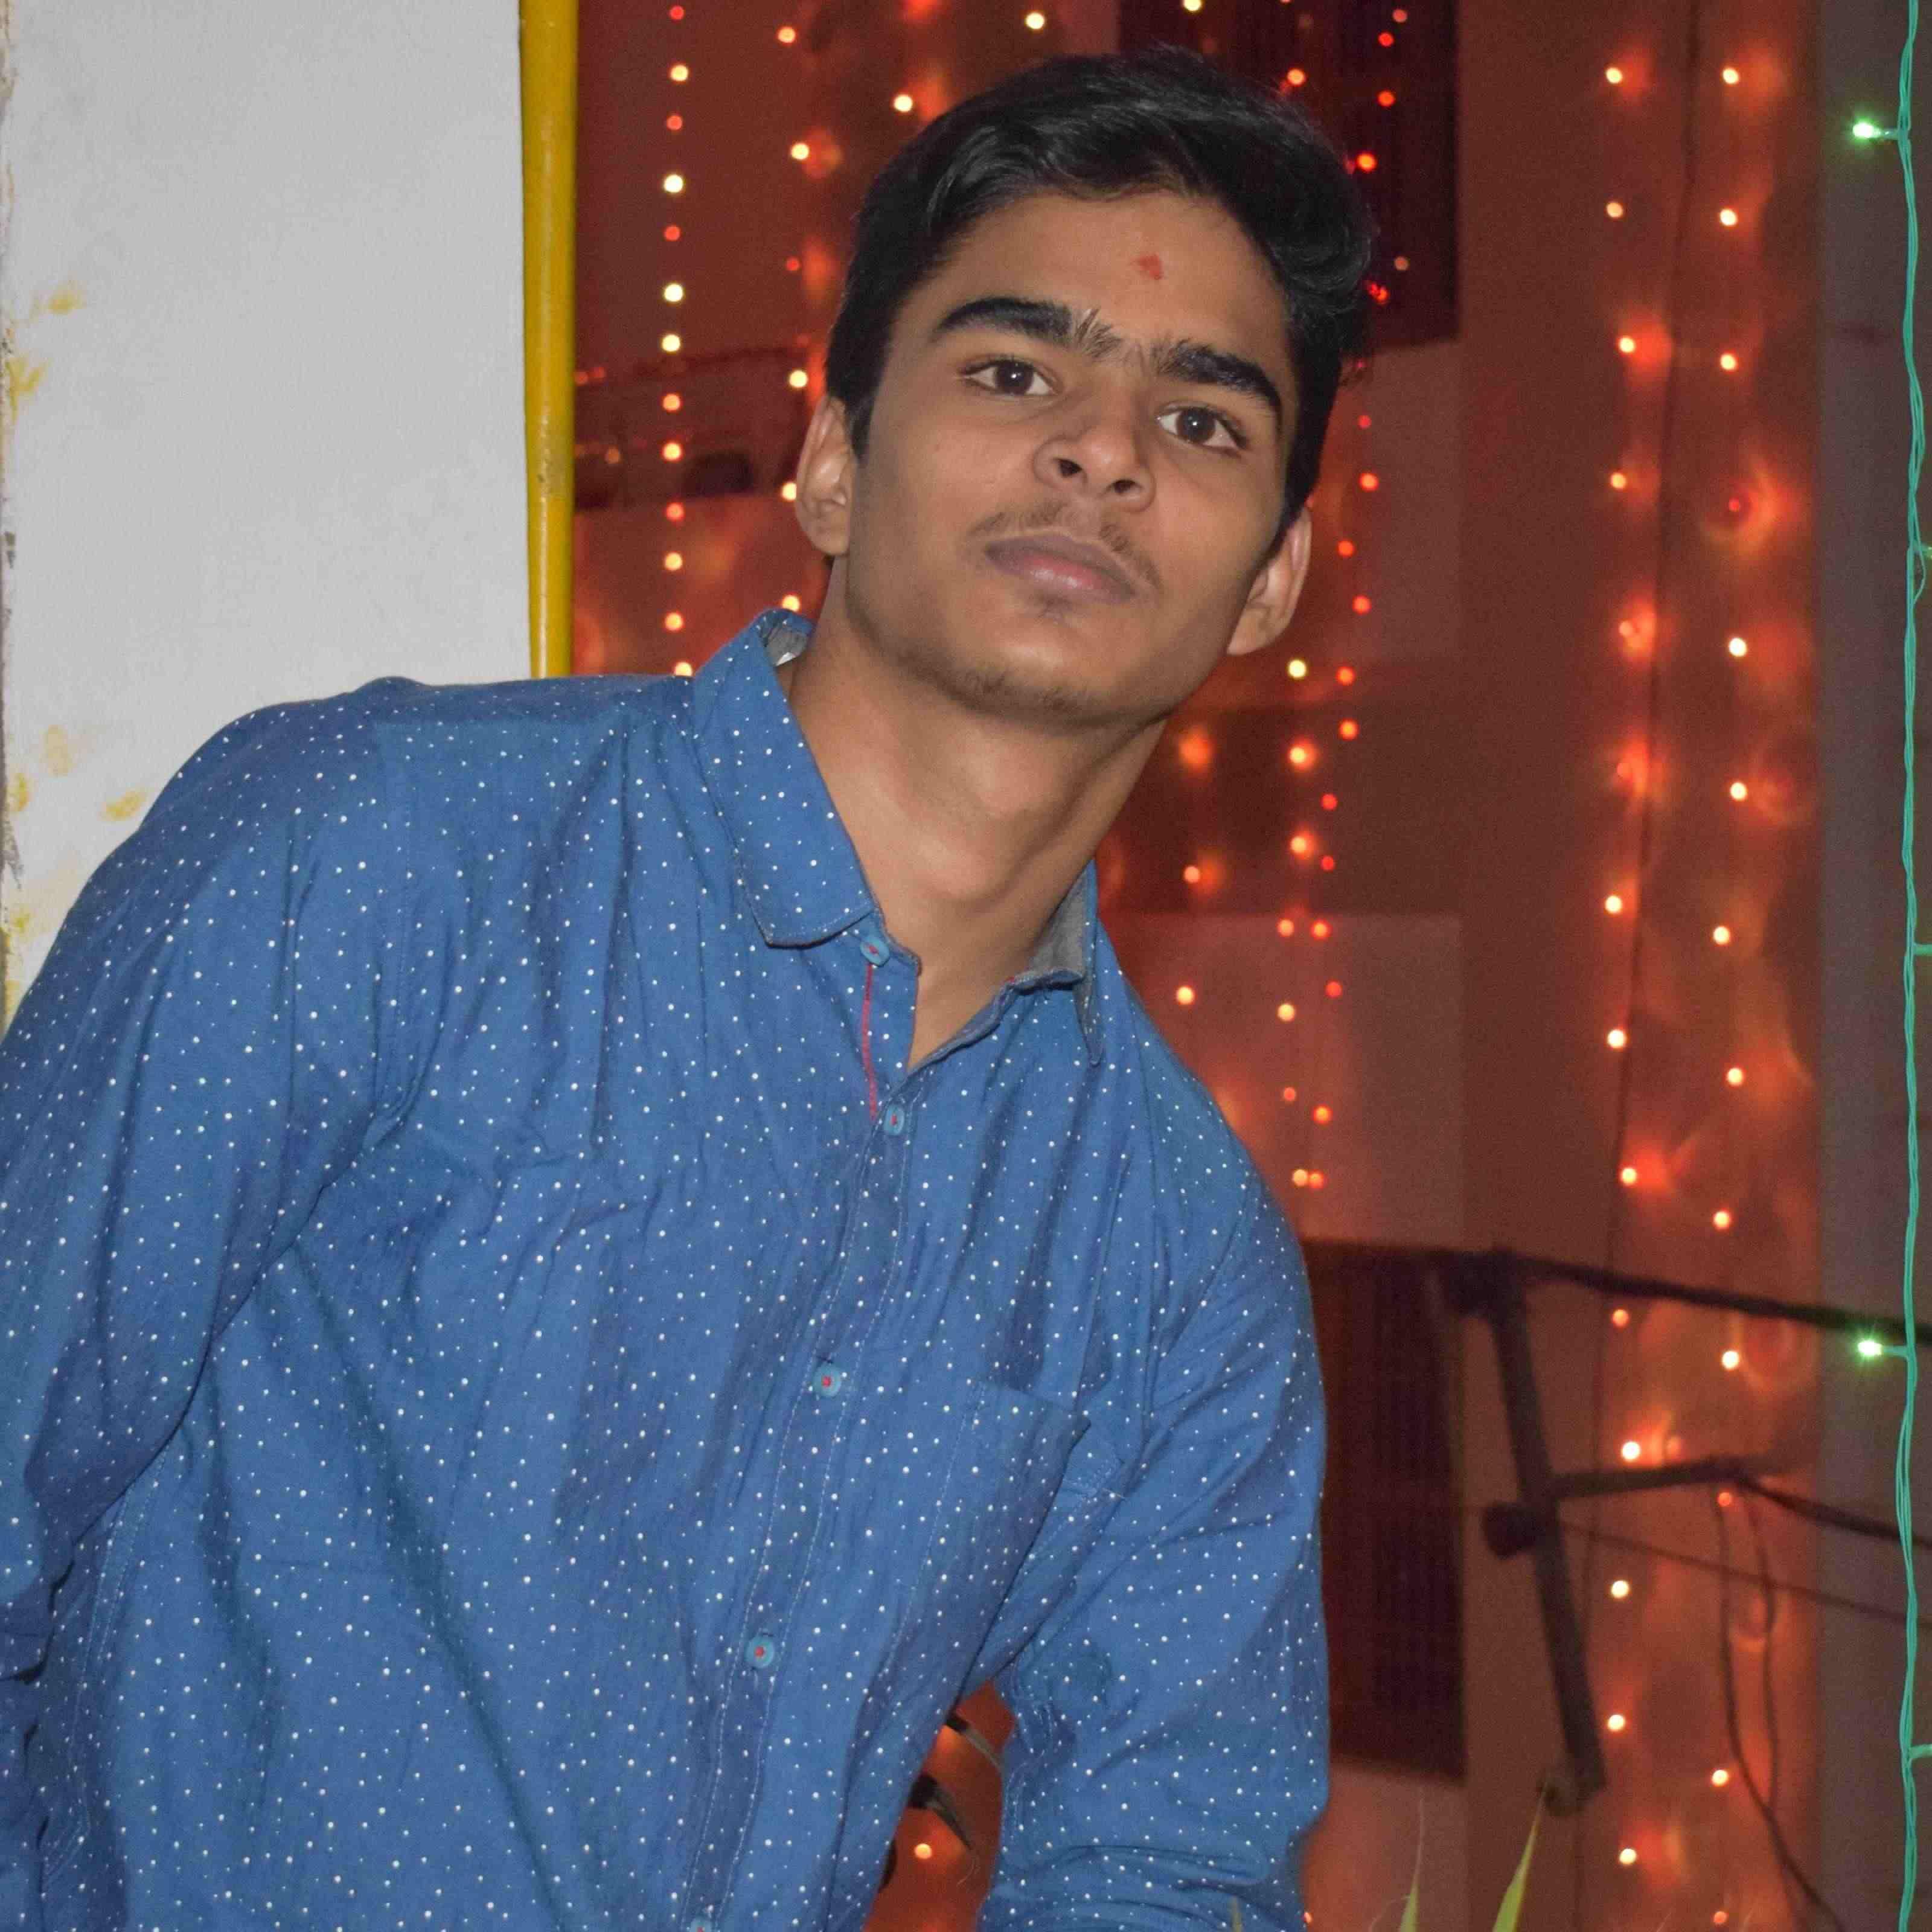 "Nikhil Srivastava dilo pe raj karta ho, dosto ki jaan kehlata ho, sachi baat krta ho. Follow me on insta ""nik_7275"""